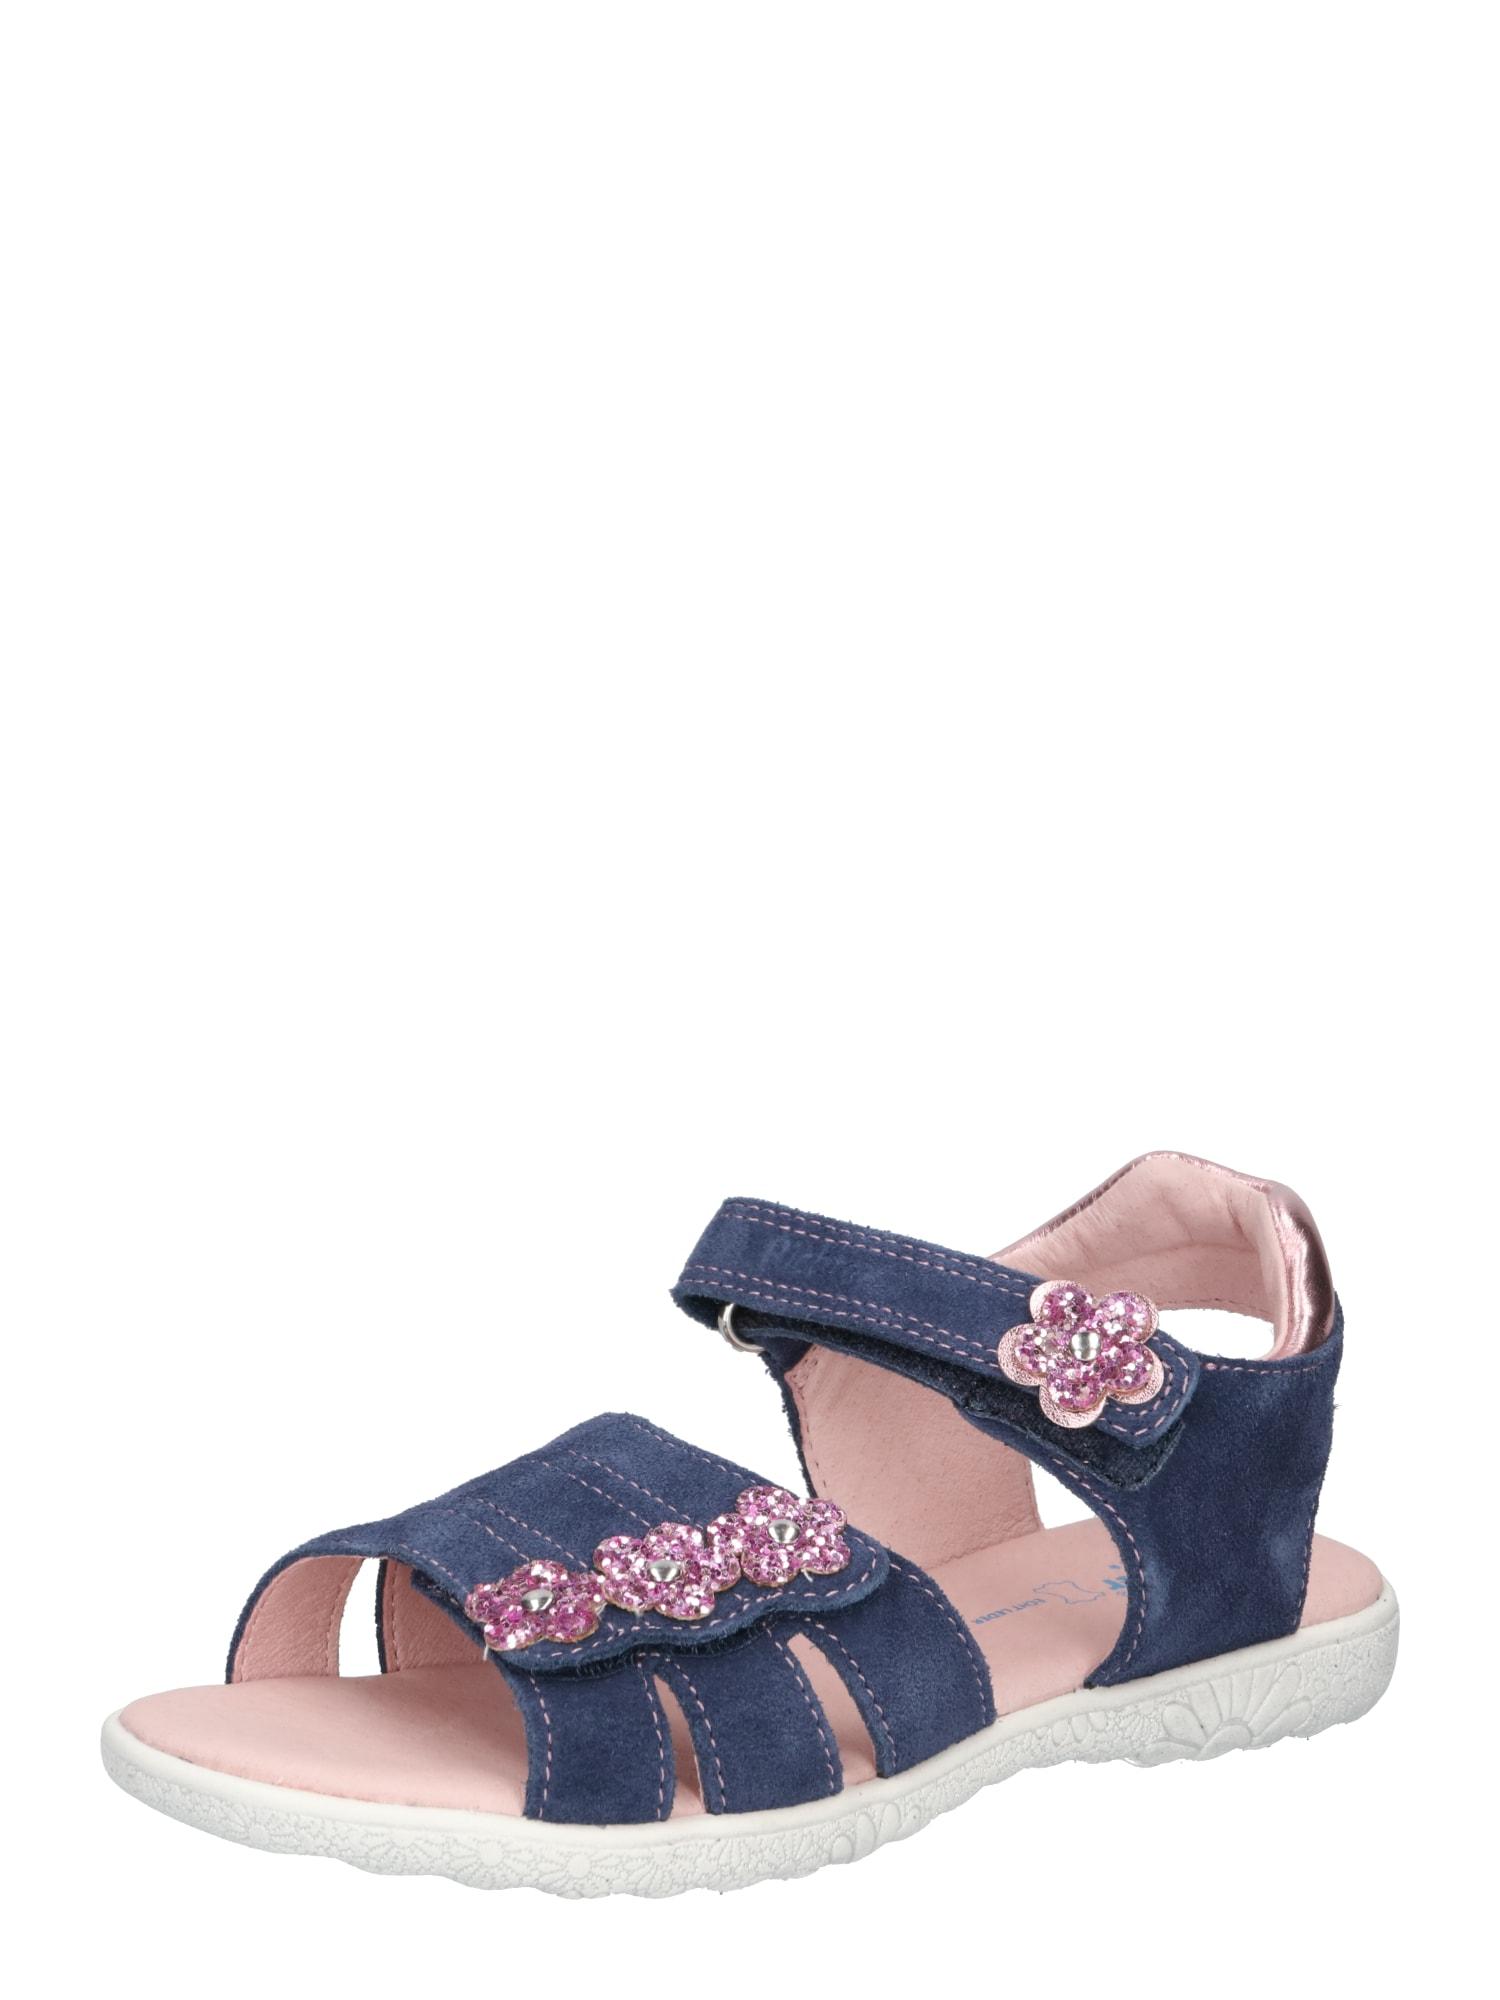 RICHTER Sandalai mėlyna / rožinė